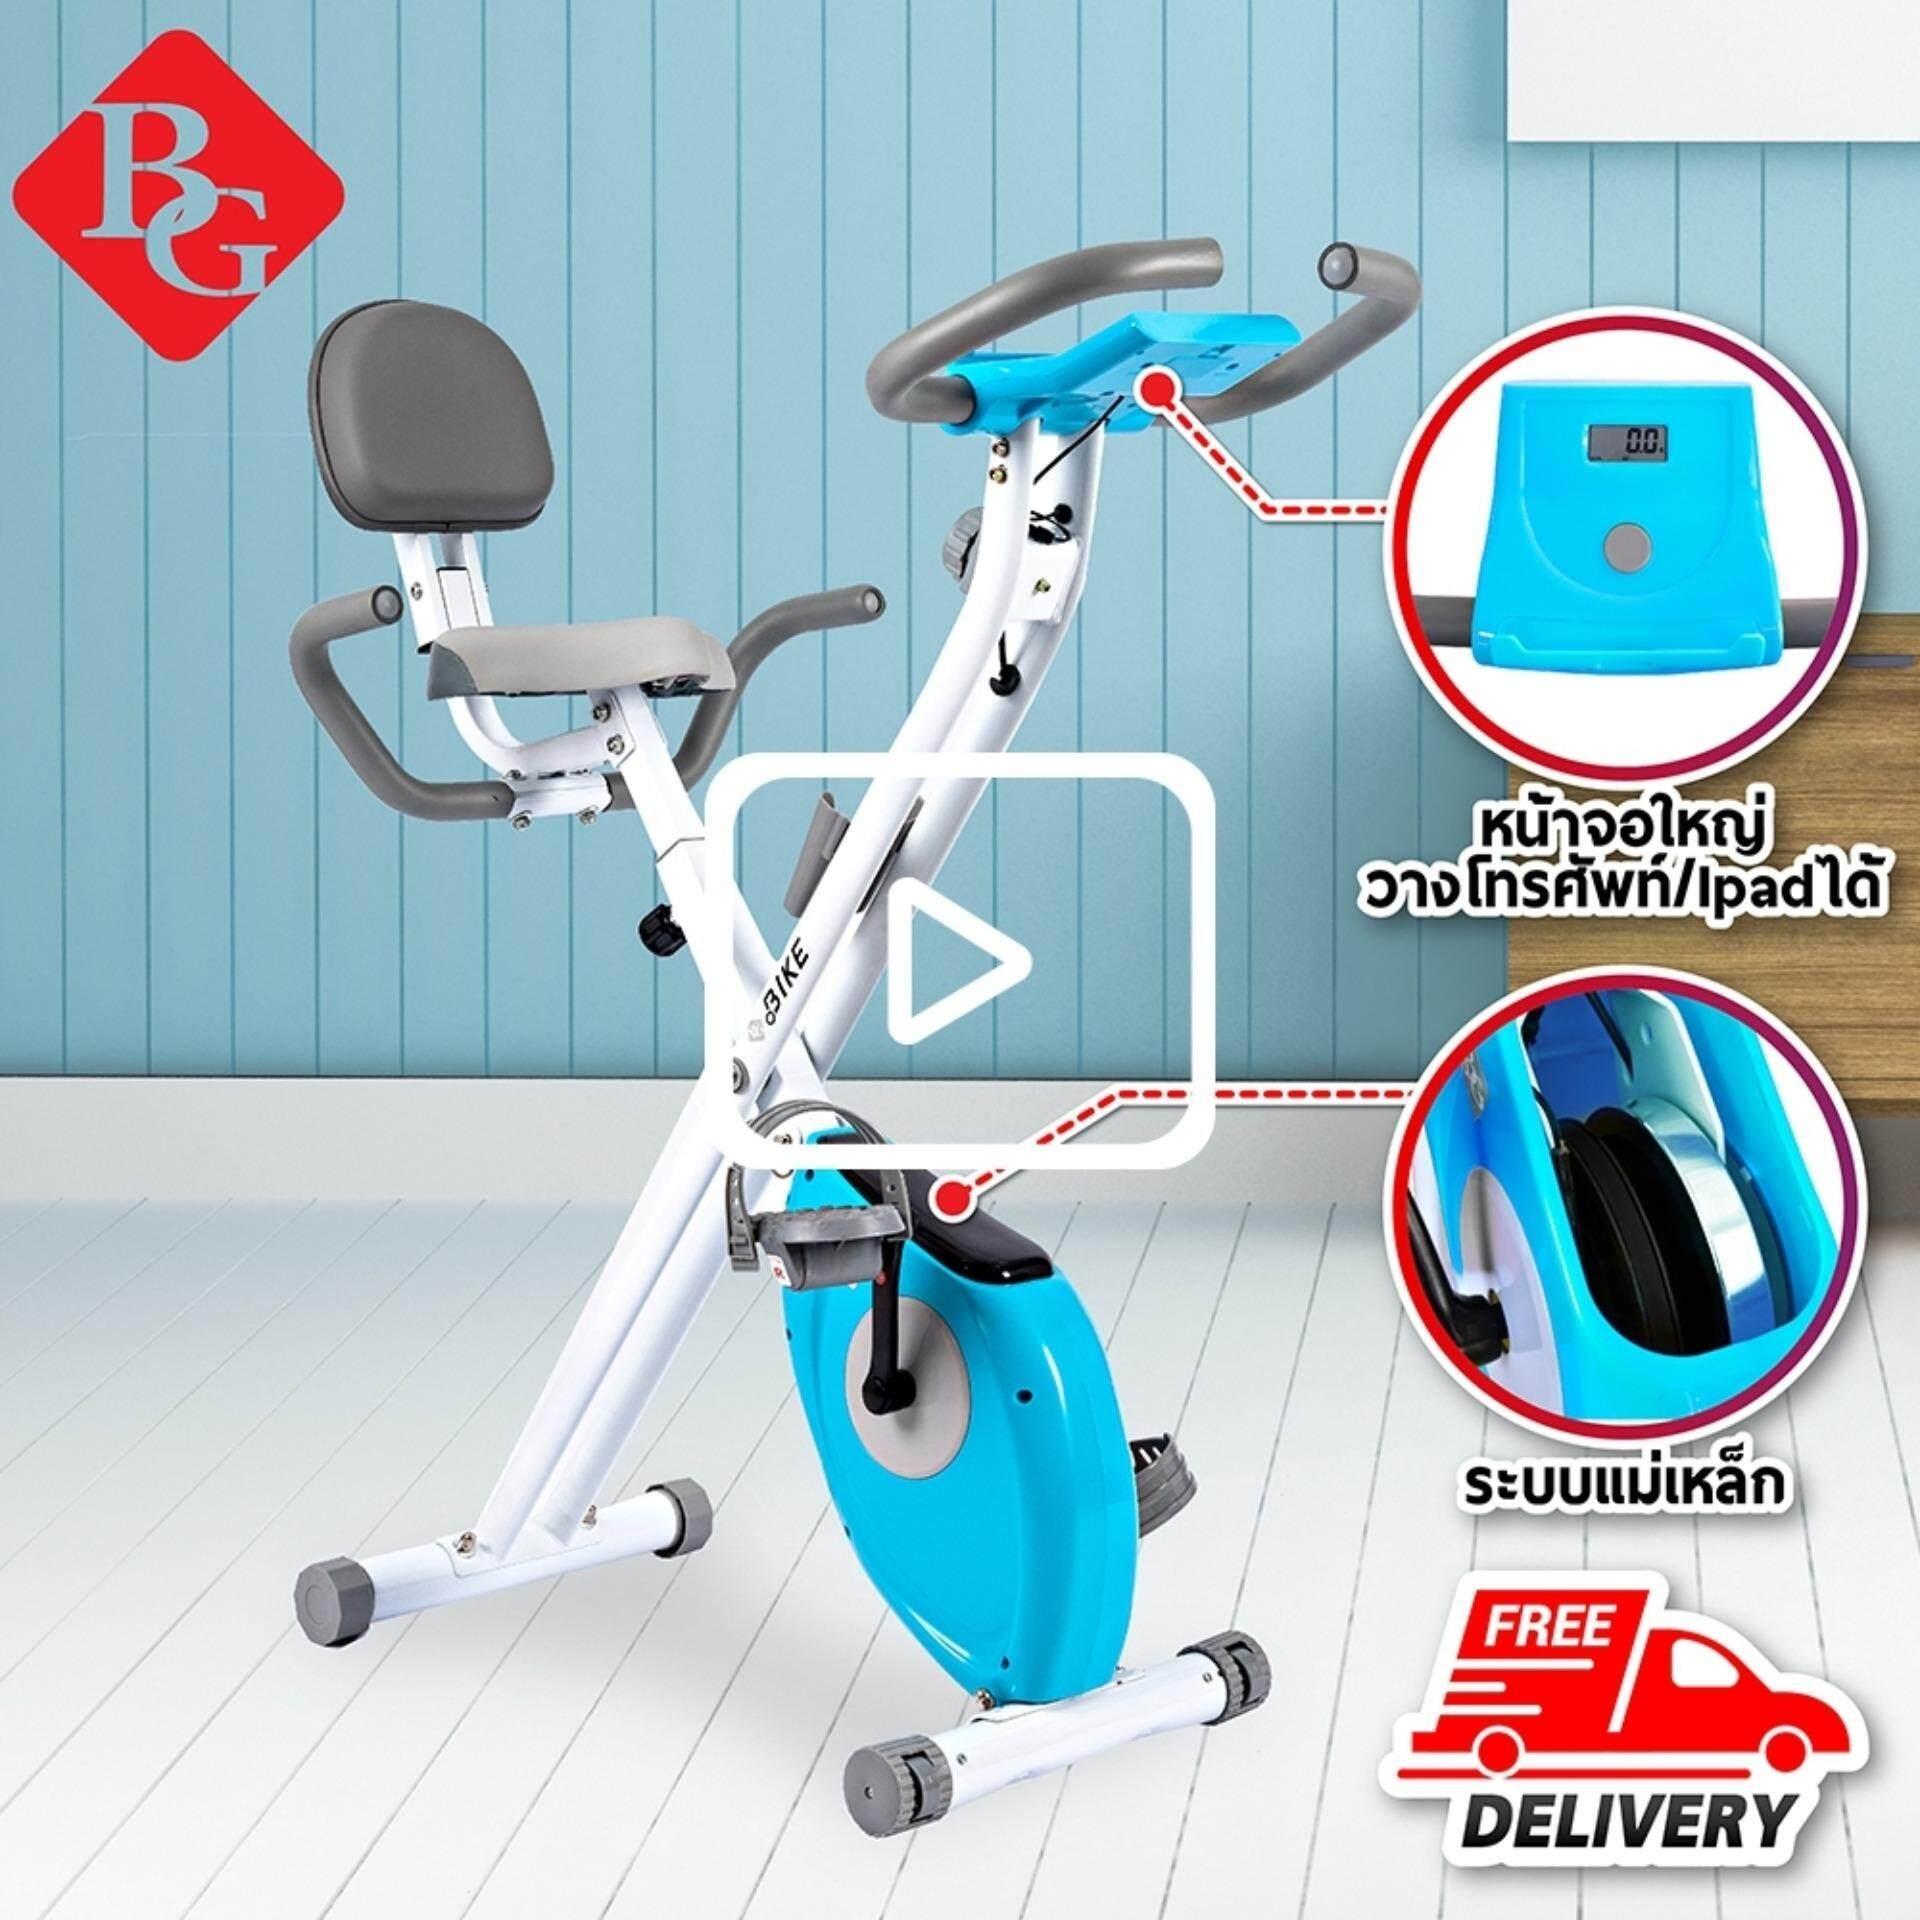 B&G Exercise Bike จักรยานออกกำลังกาย X - Bike (Blue) - รุ่น YS04